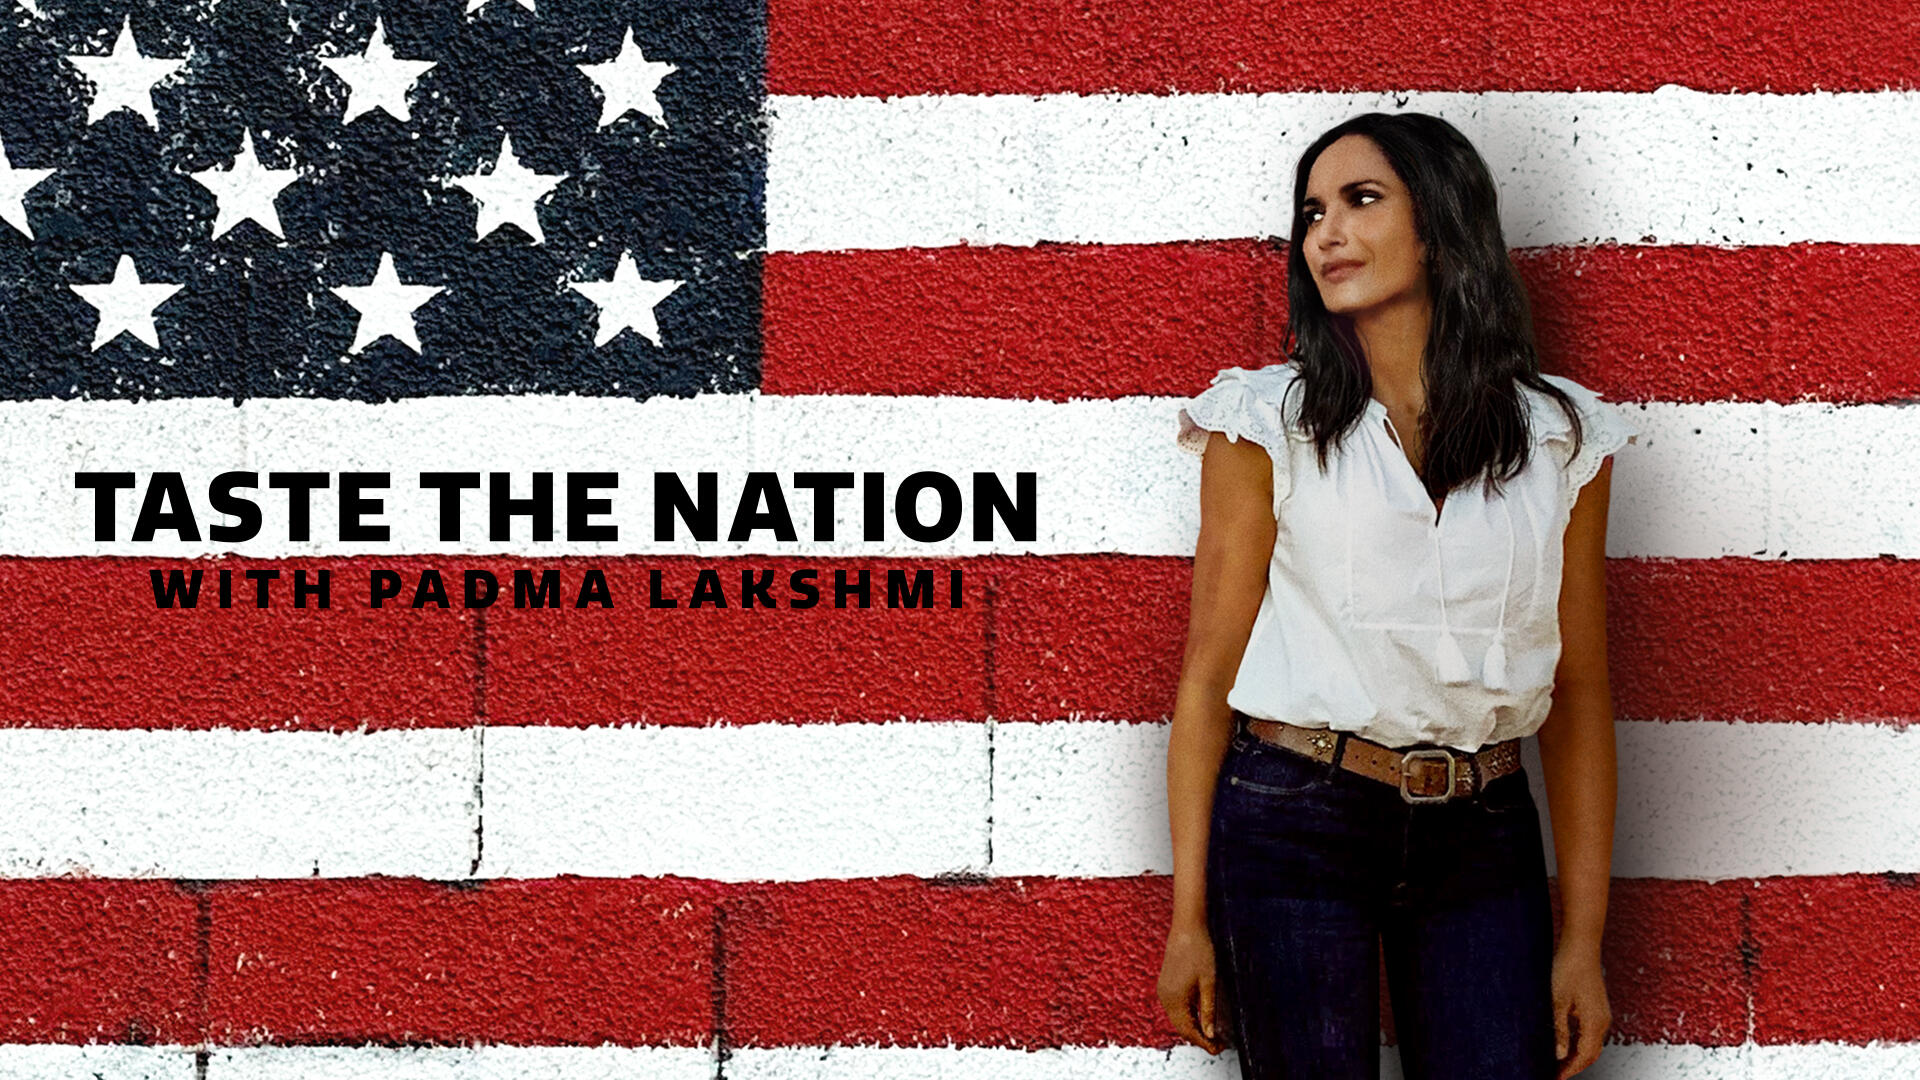 Taste_The_Nation_With_Padma_Lakshmi_16x9